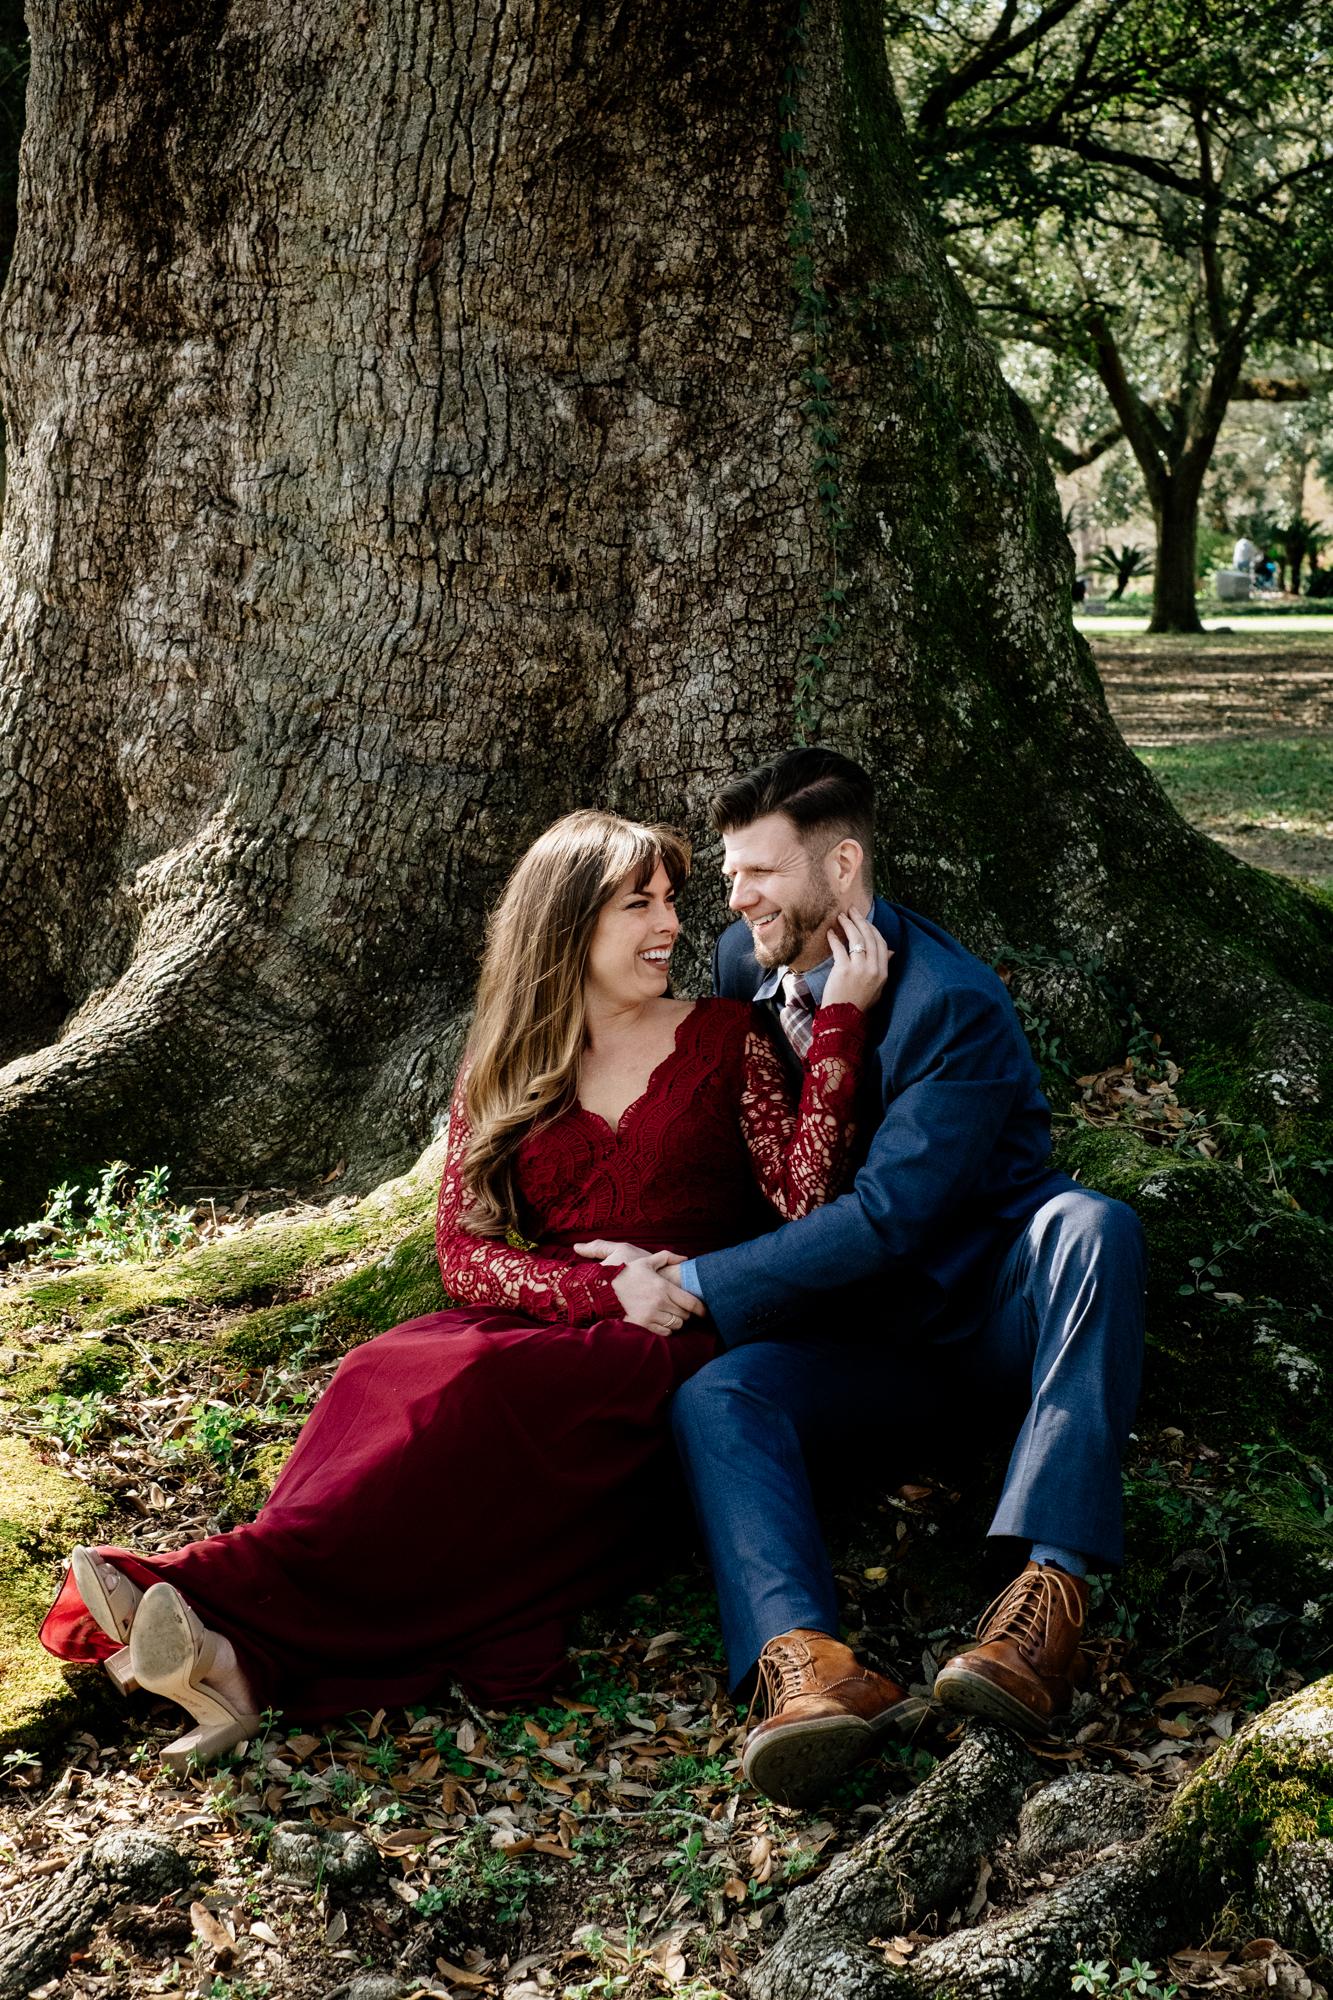 Jen_Montgomery_Photography_Angela_Brian_Engagement_Proposal_FB-155.jpg